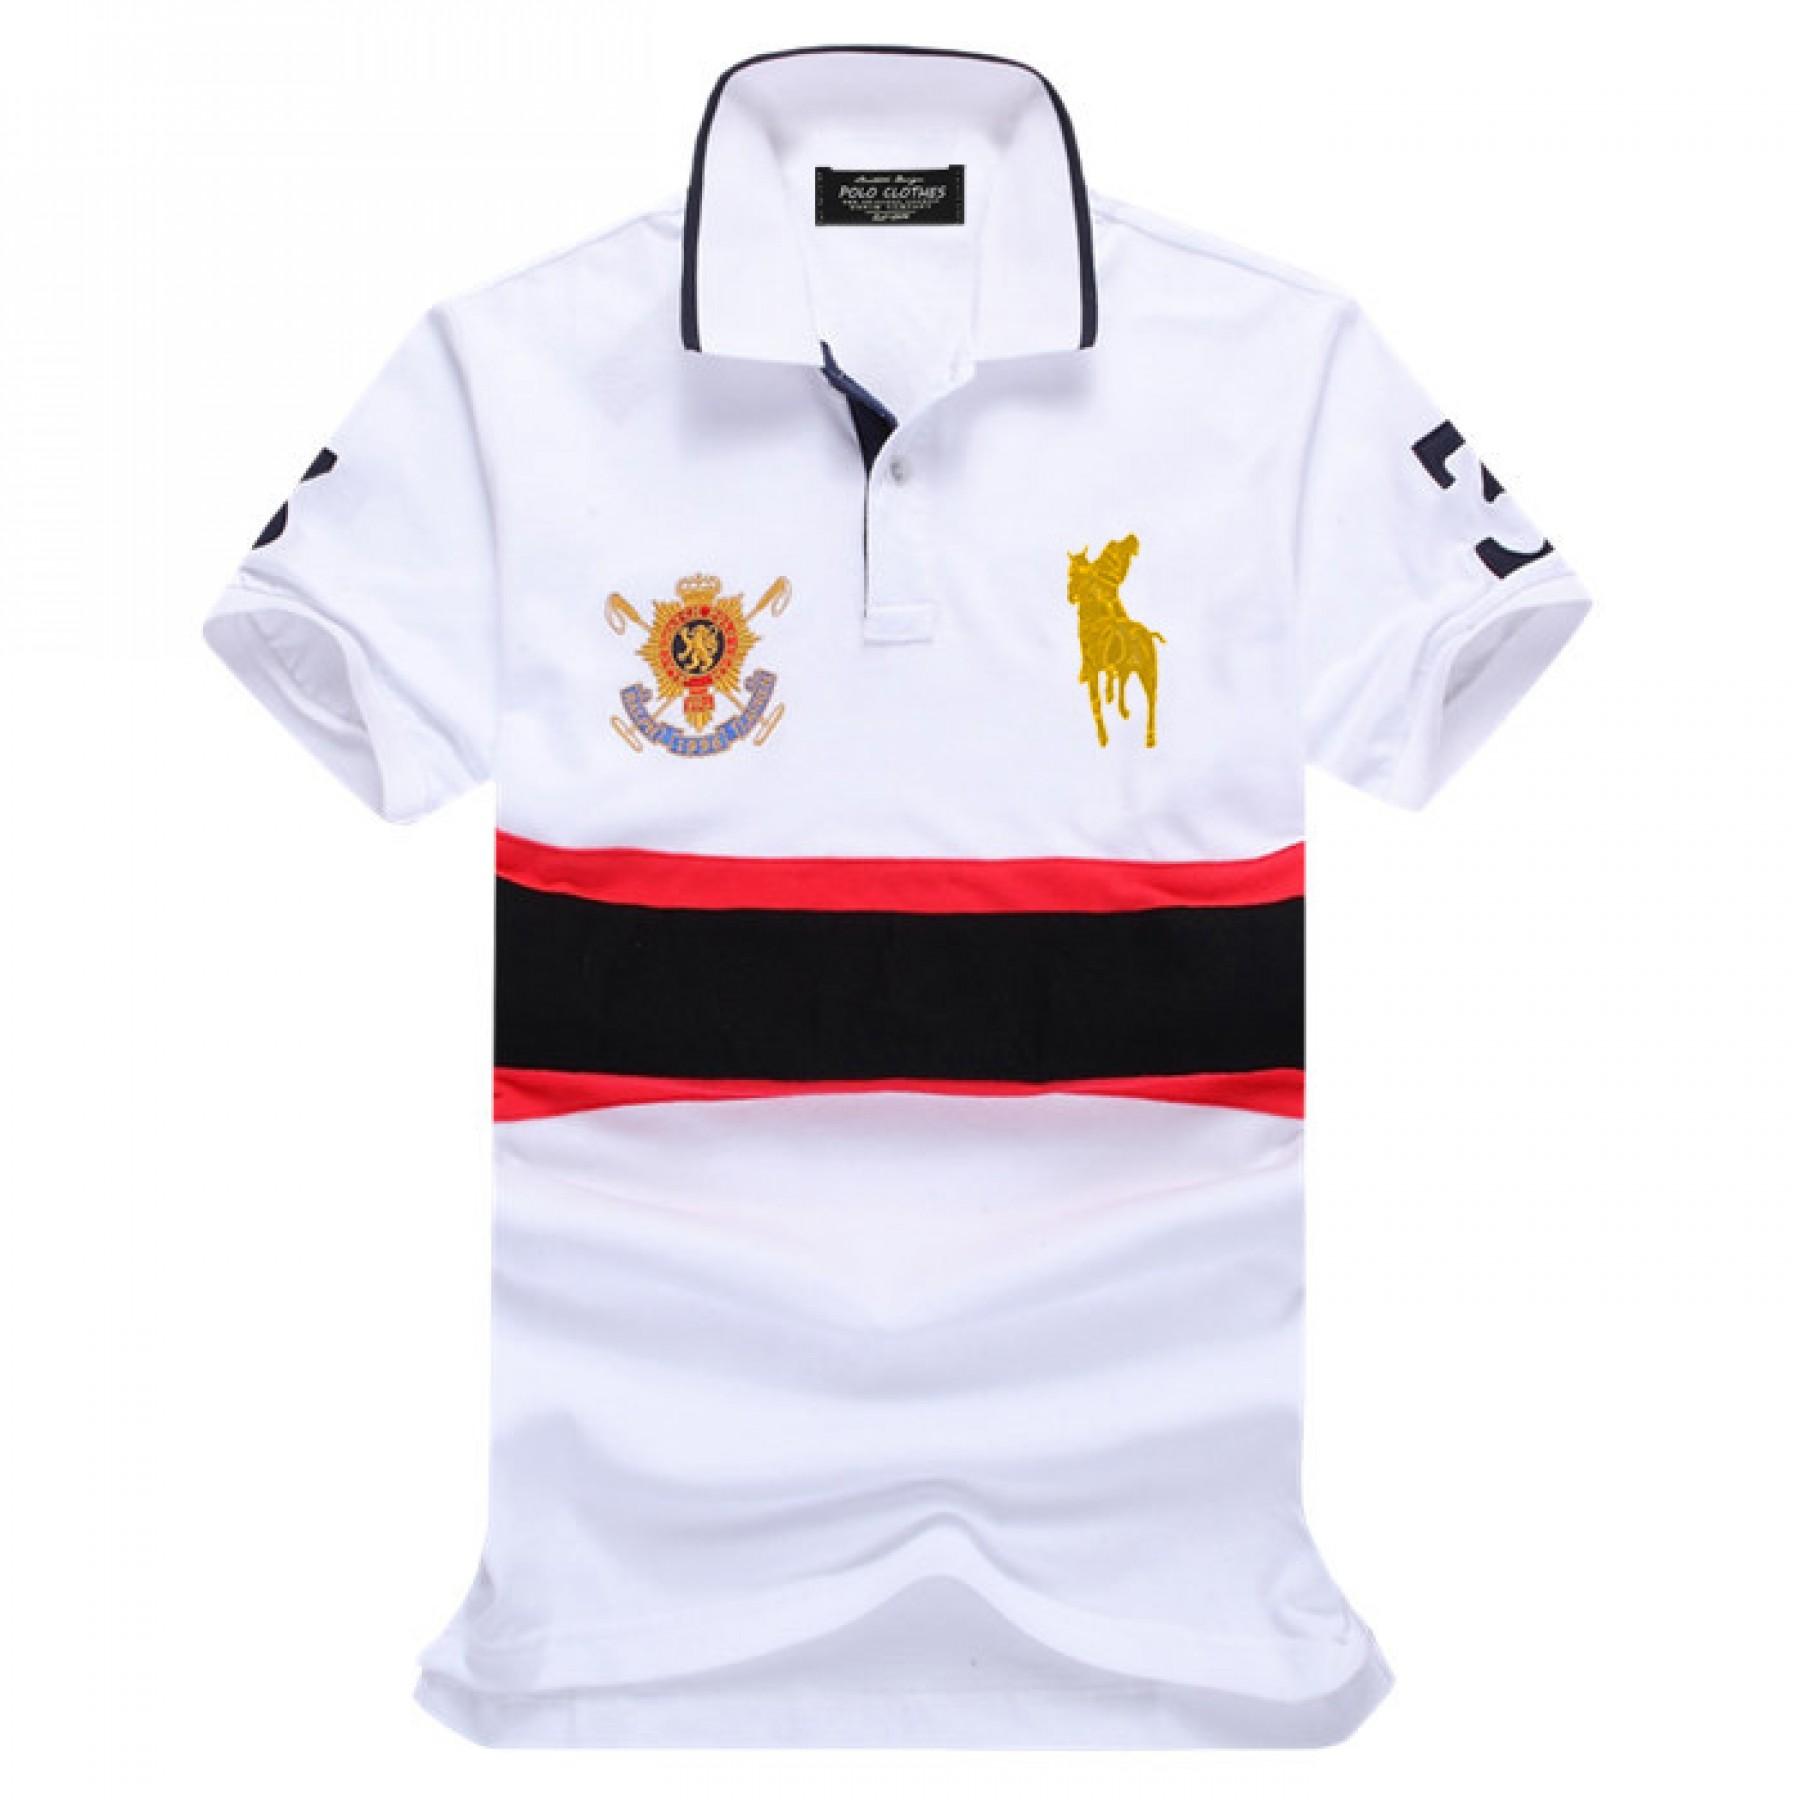 Camisa Polo Masculino Ralph Lauren com Bordados Cod 0528 a9d218e18a0